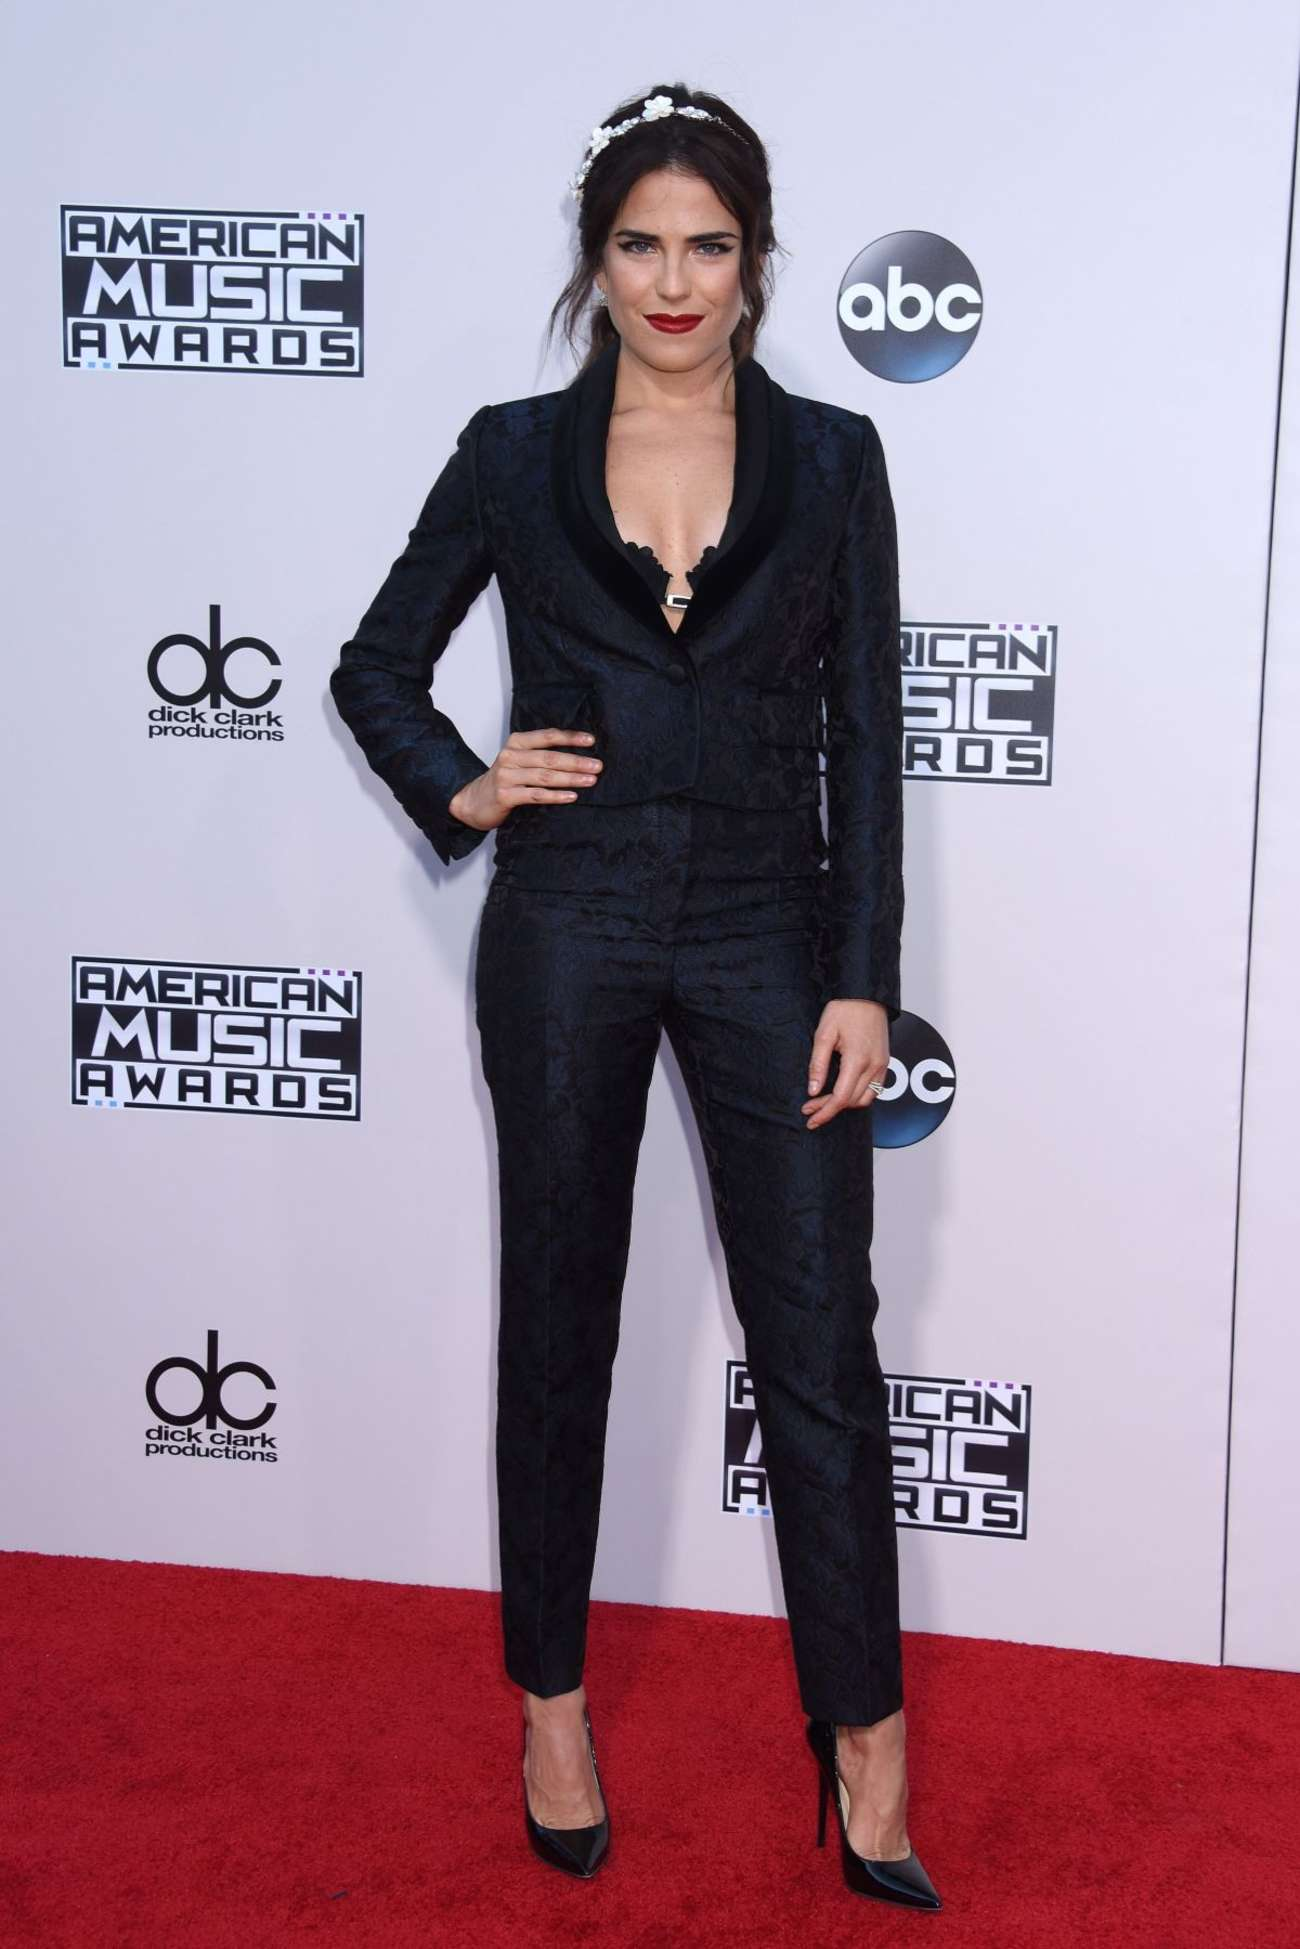 Karla Souza American Music Awards in Los Angeles